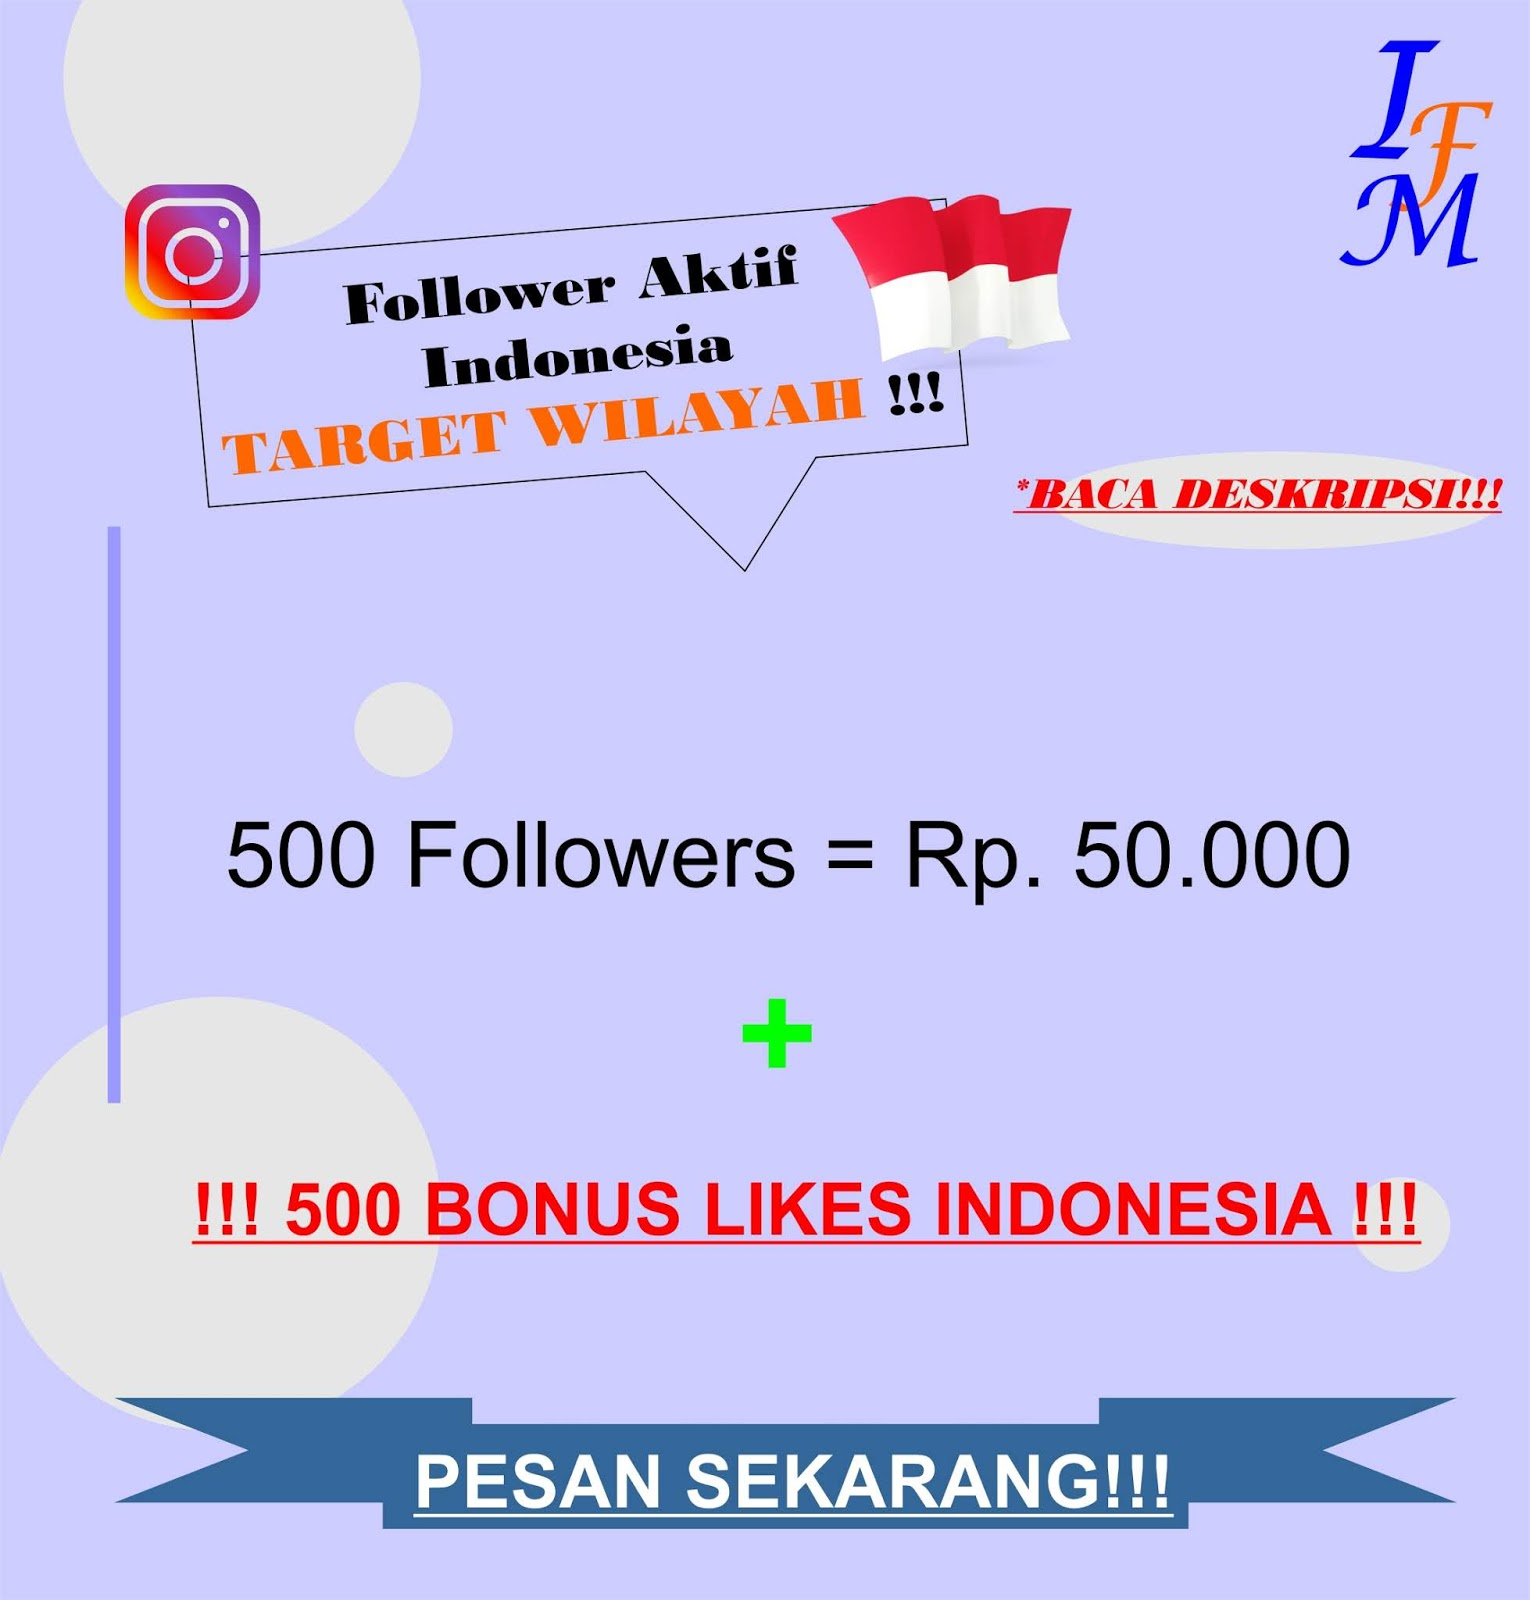 Jasa Tambah 500 Follower Akun Instagram Aktif Indonesia Target Wilayah Murah